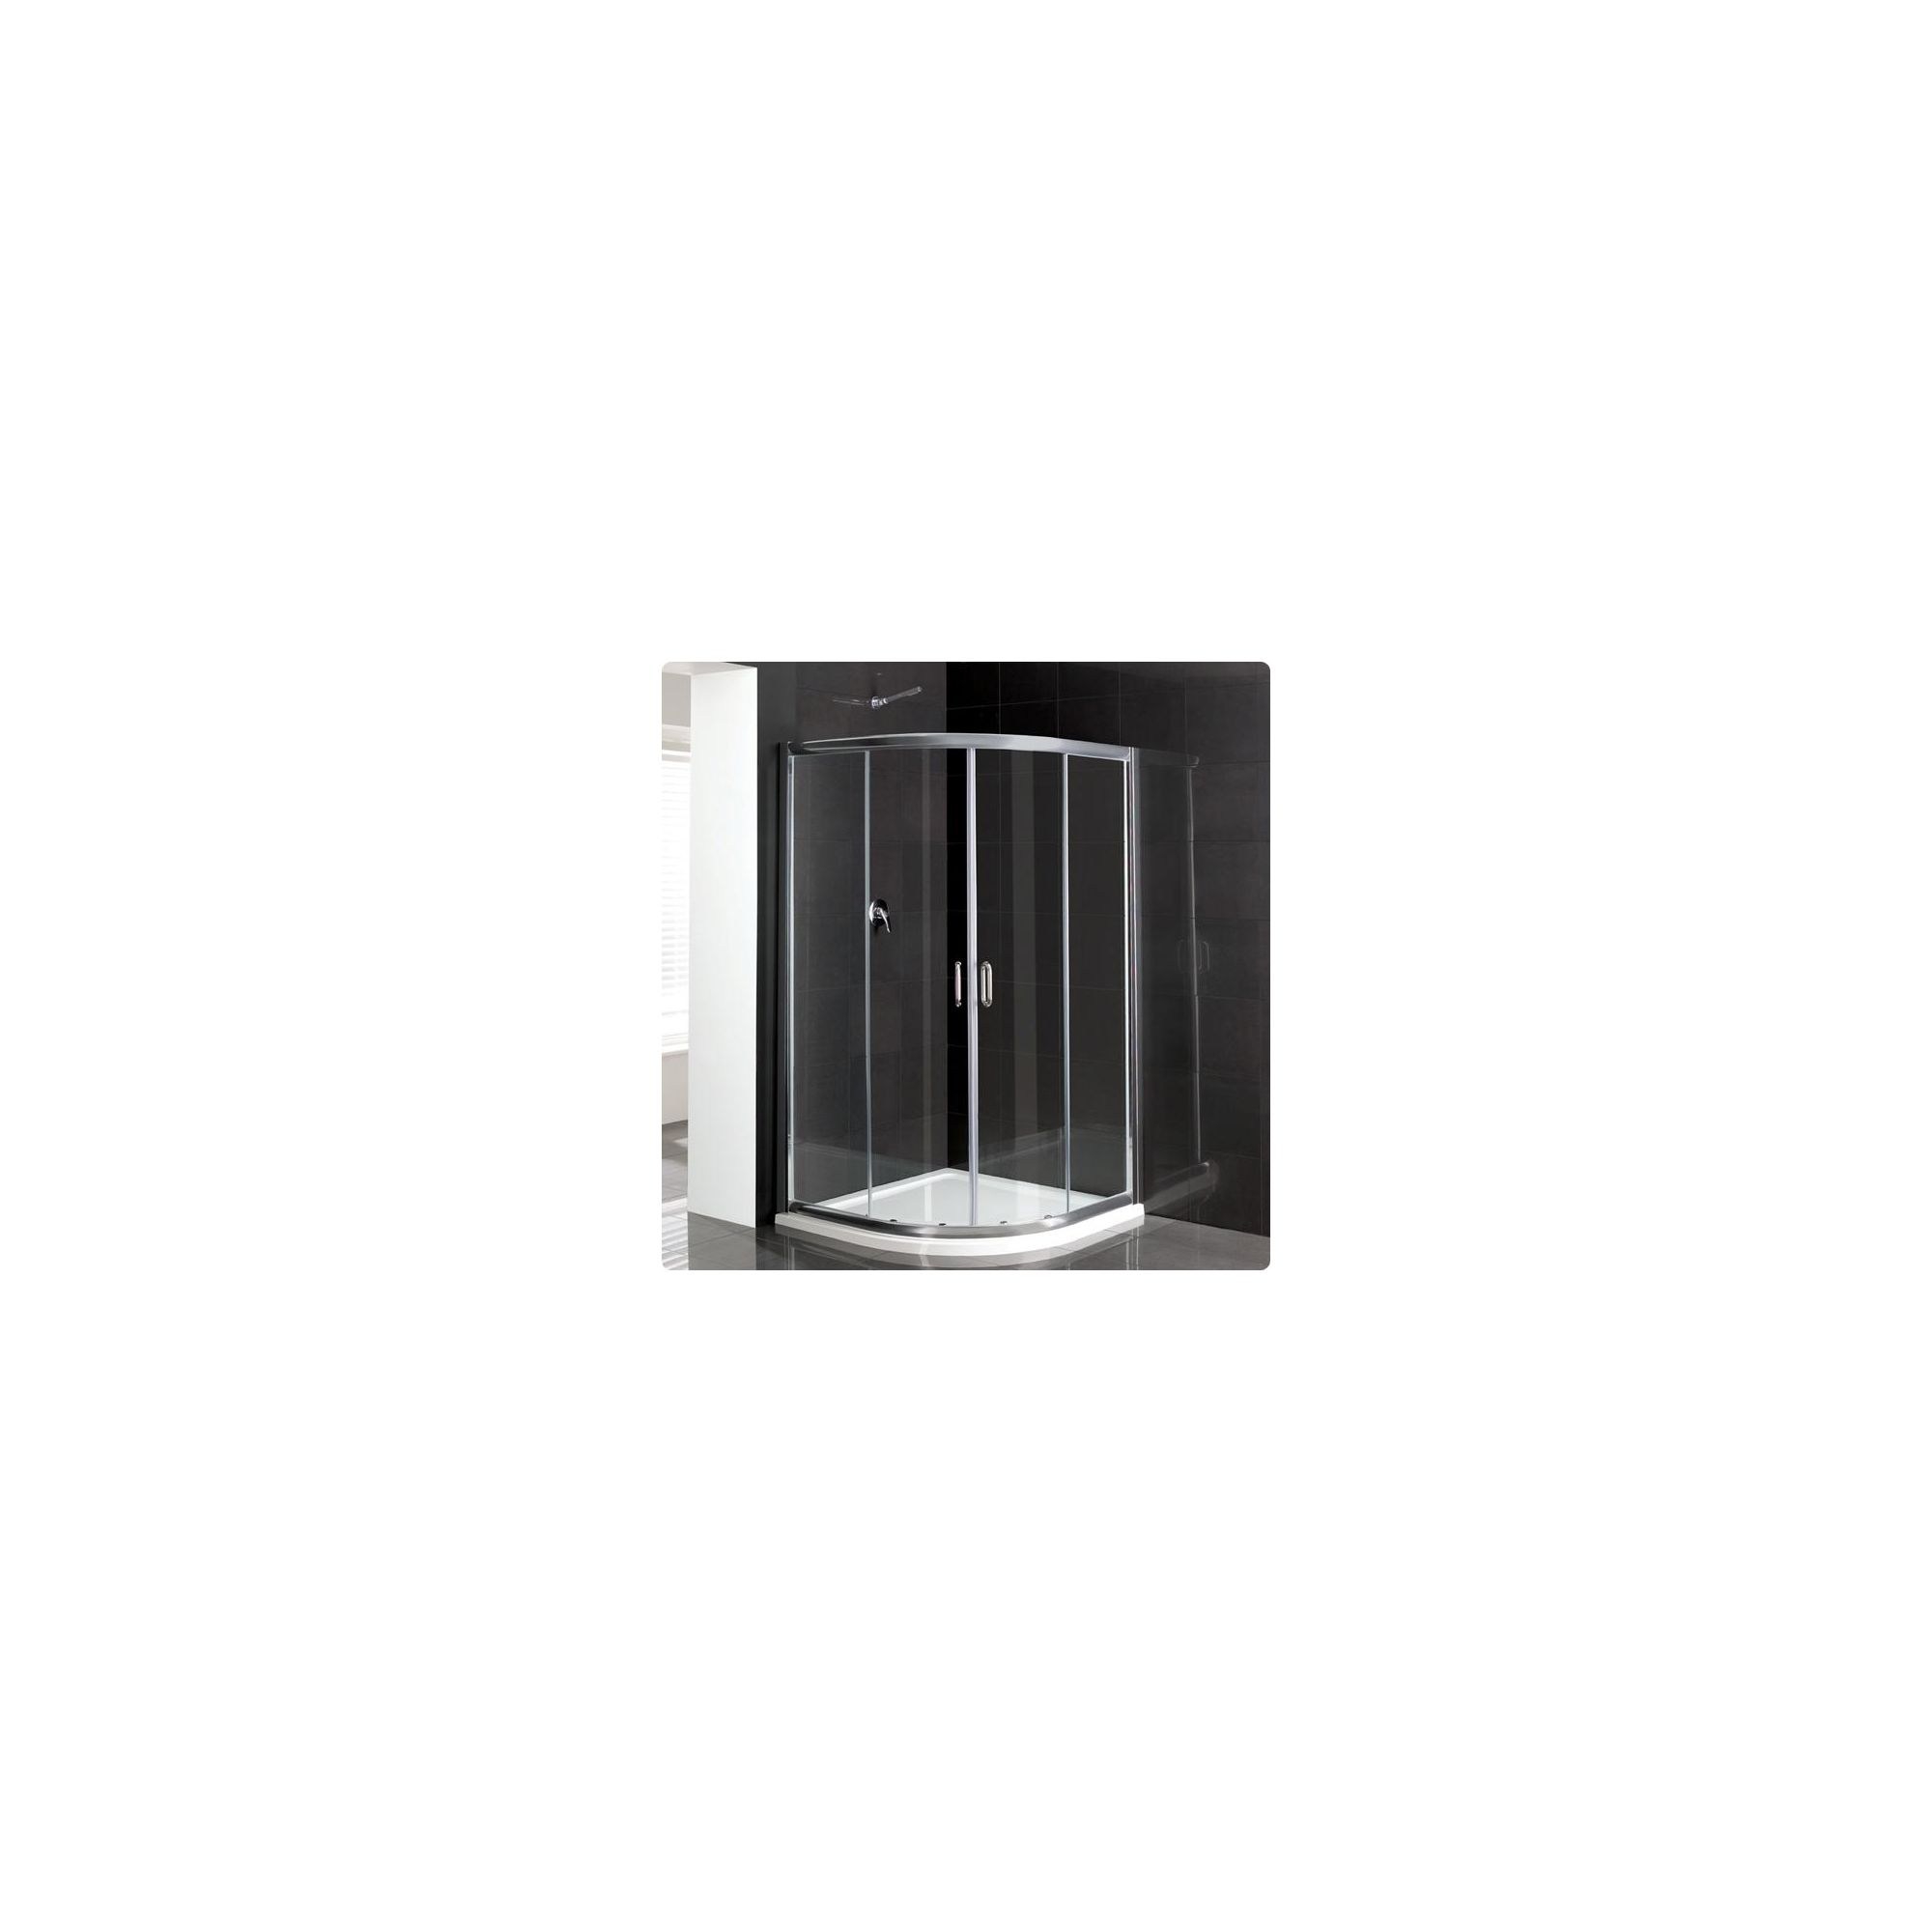 Duchy Elite Silver Quadrant Shower Enclosure 800mm, Standard Tray, 6mm Glass at Tesco Direct